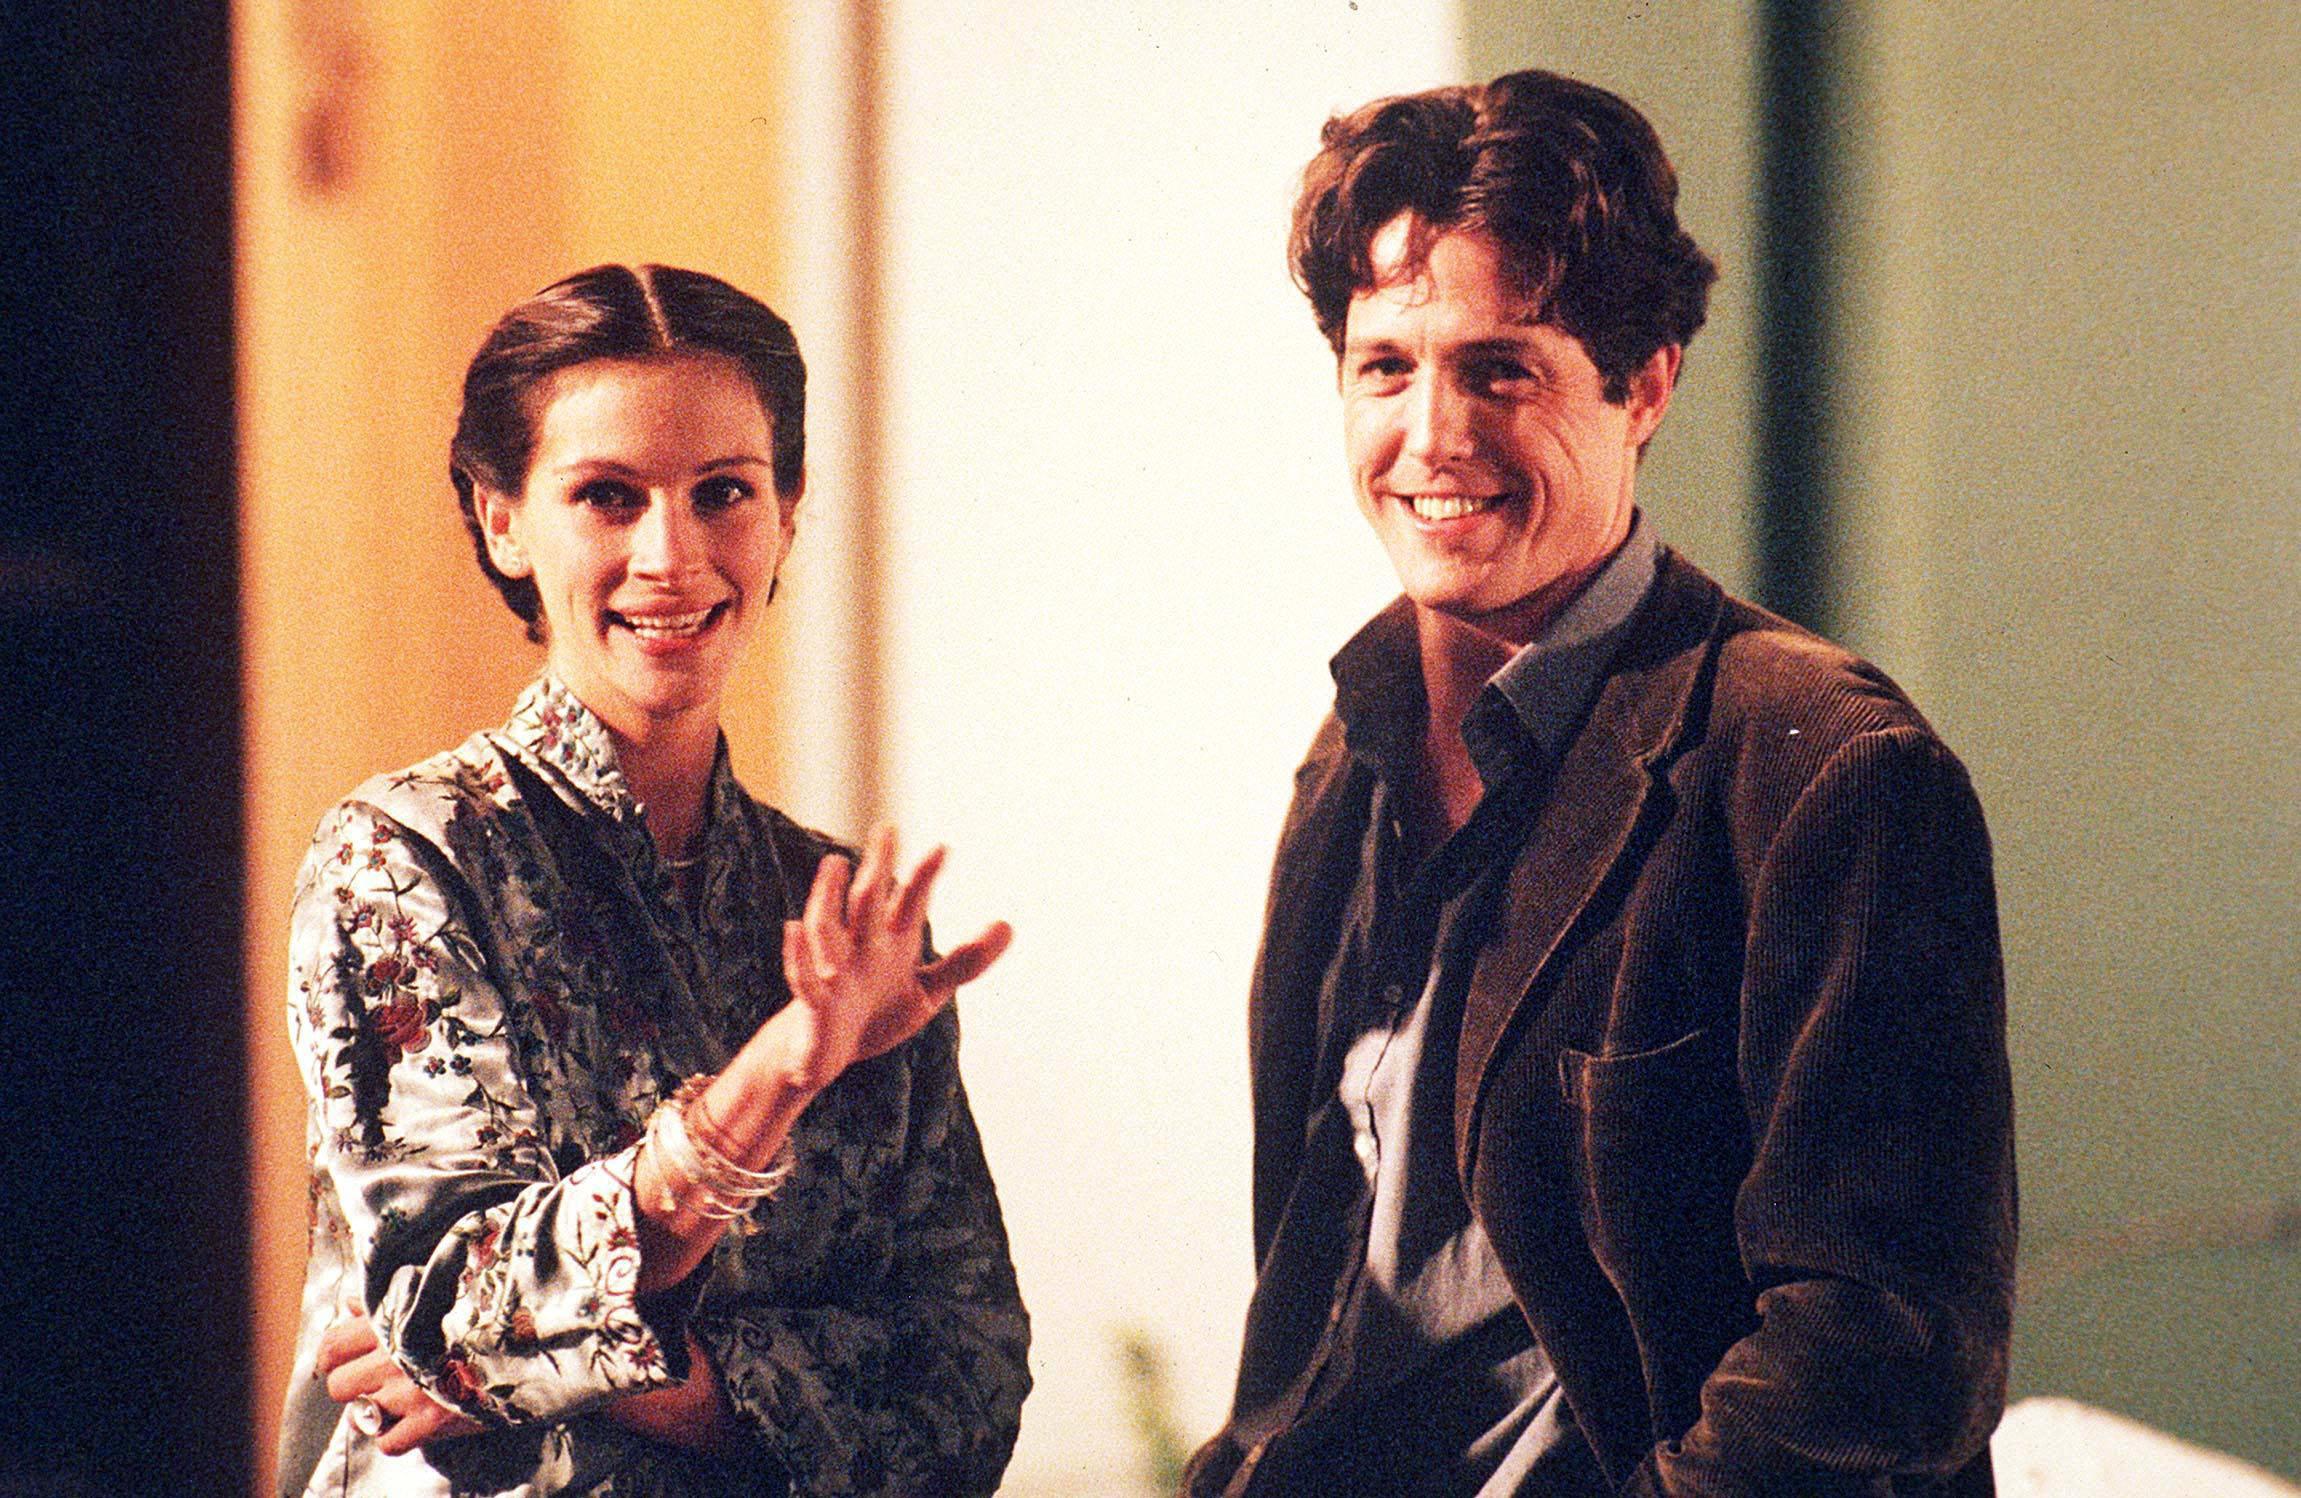 Hugh Grant & Julia Roberts in Notting Hill